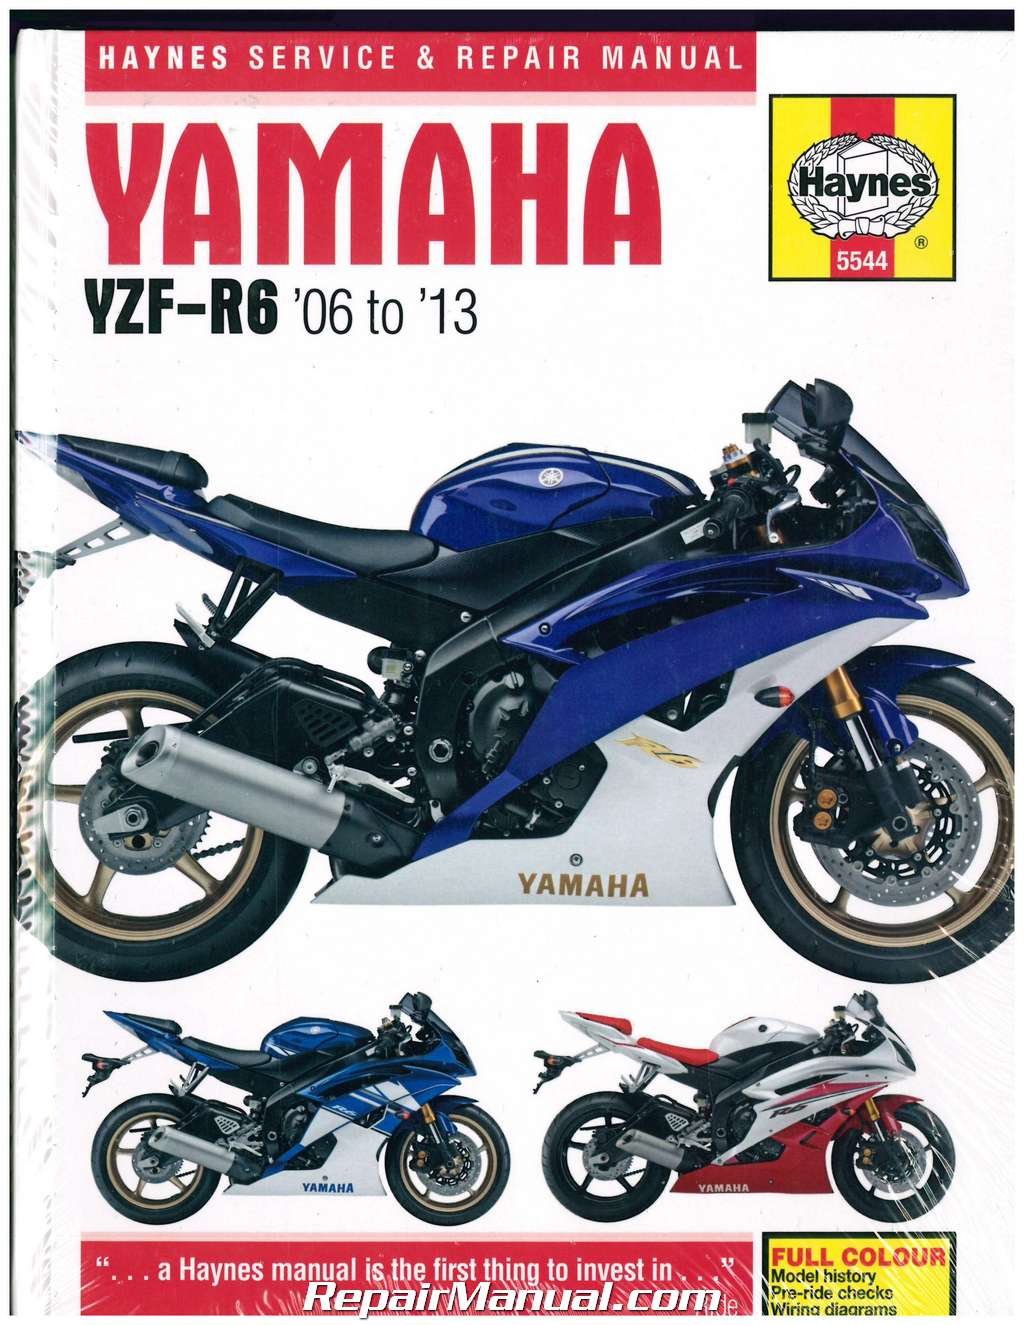 Yamaha YZF-R6 2006-2013 Haynes Motorcycle Repair Manual